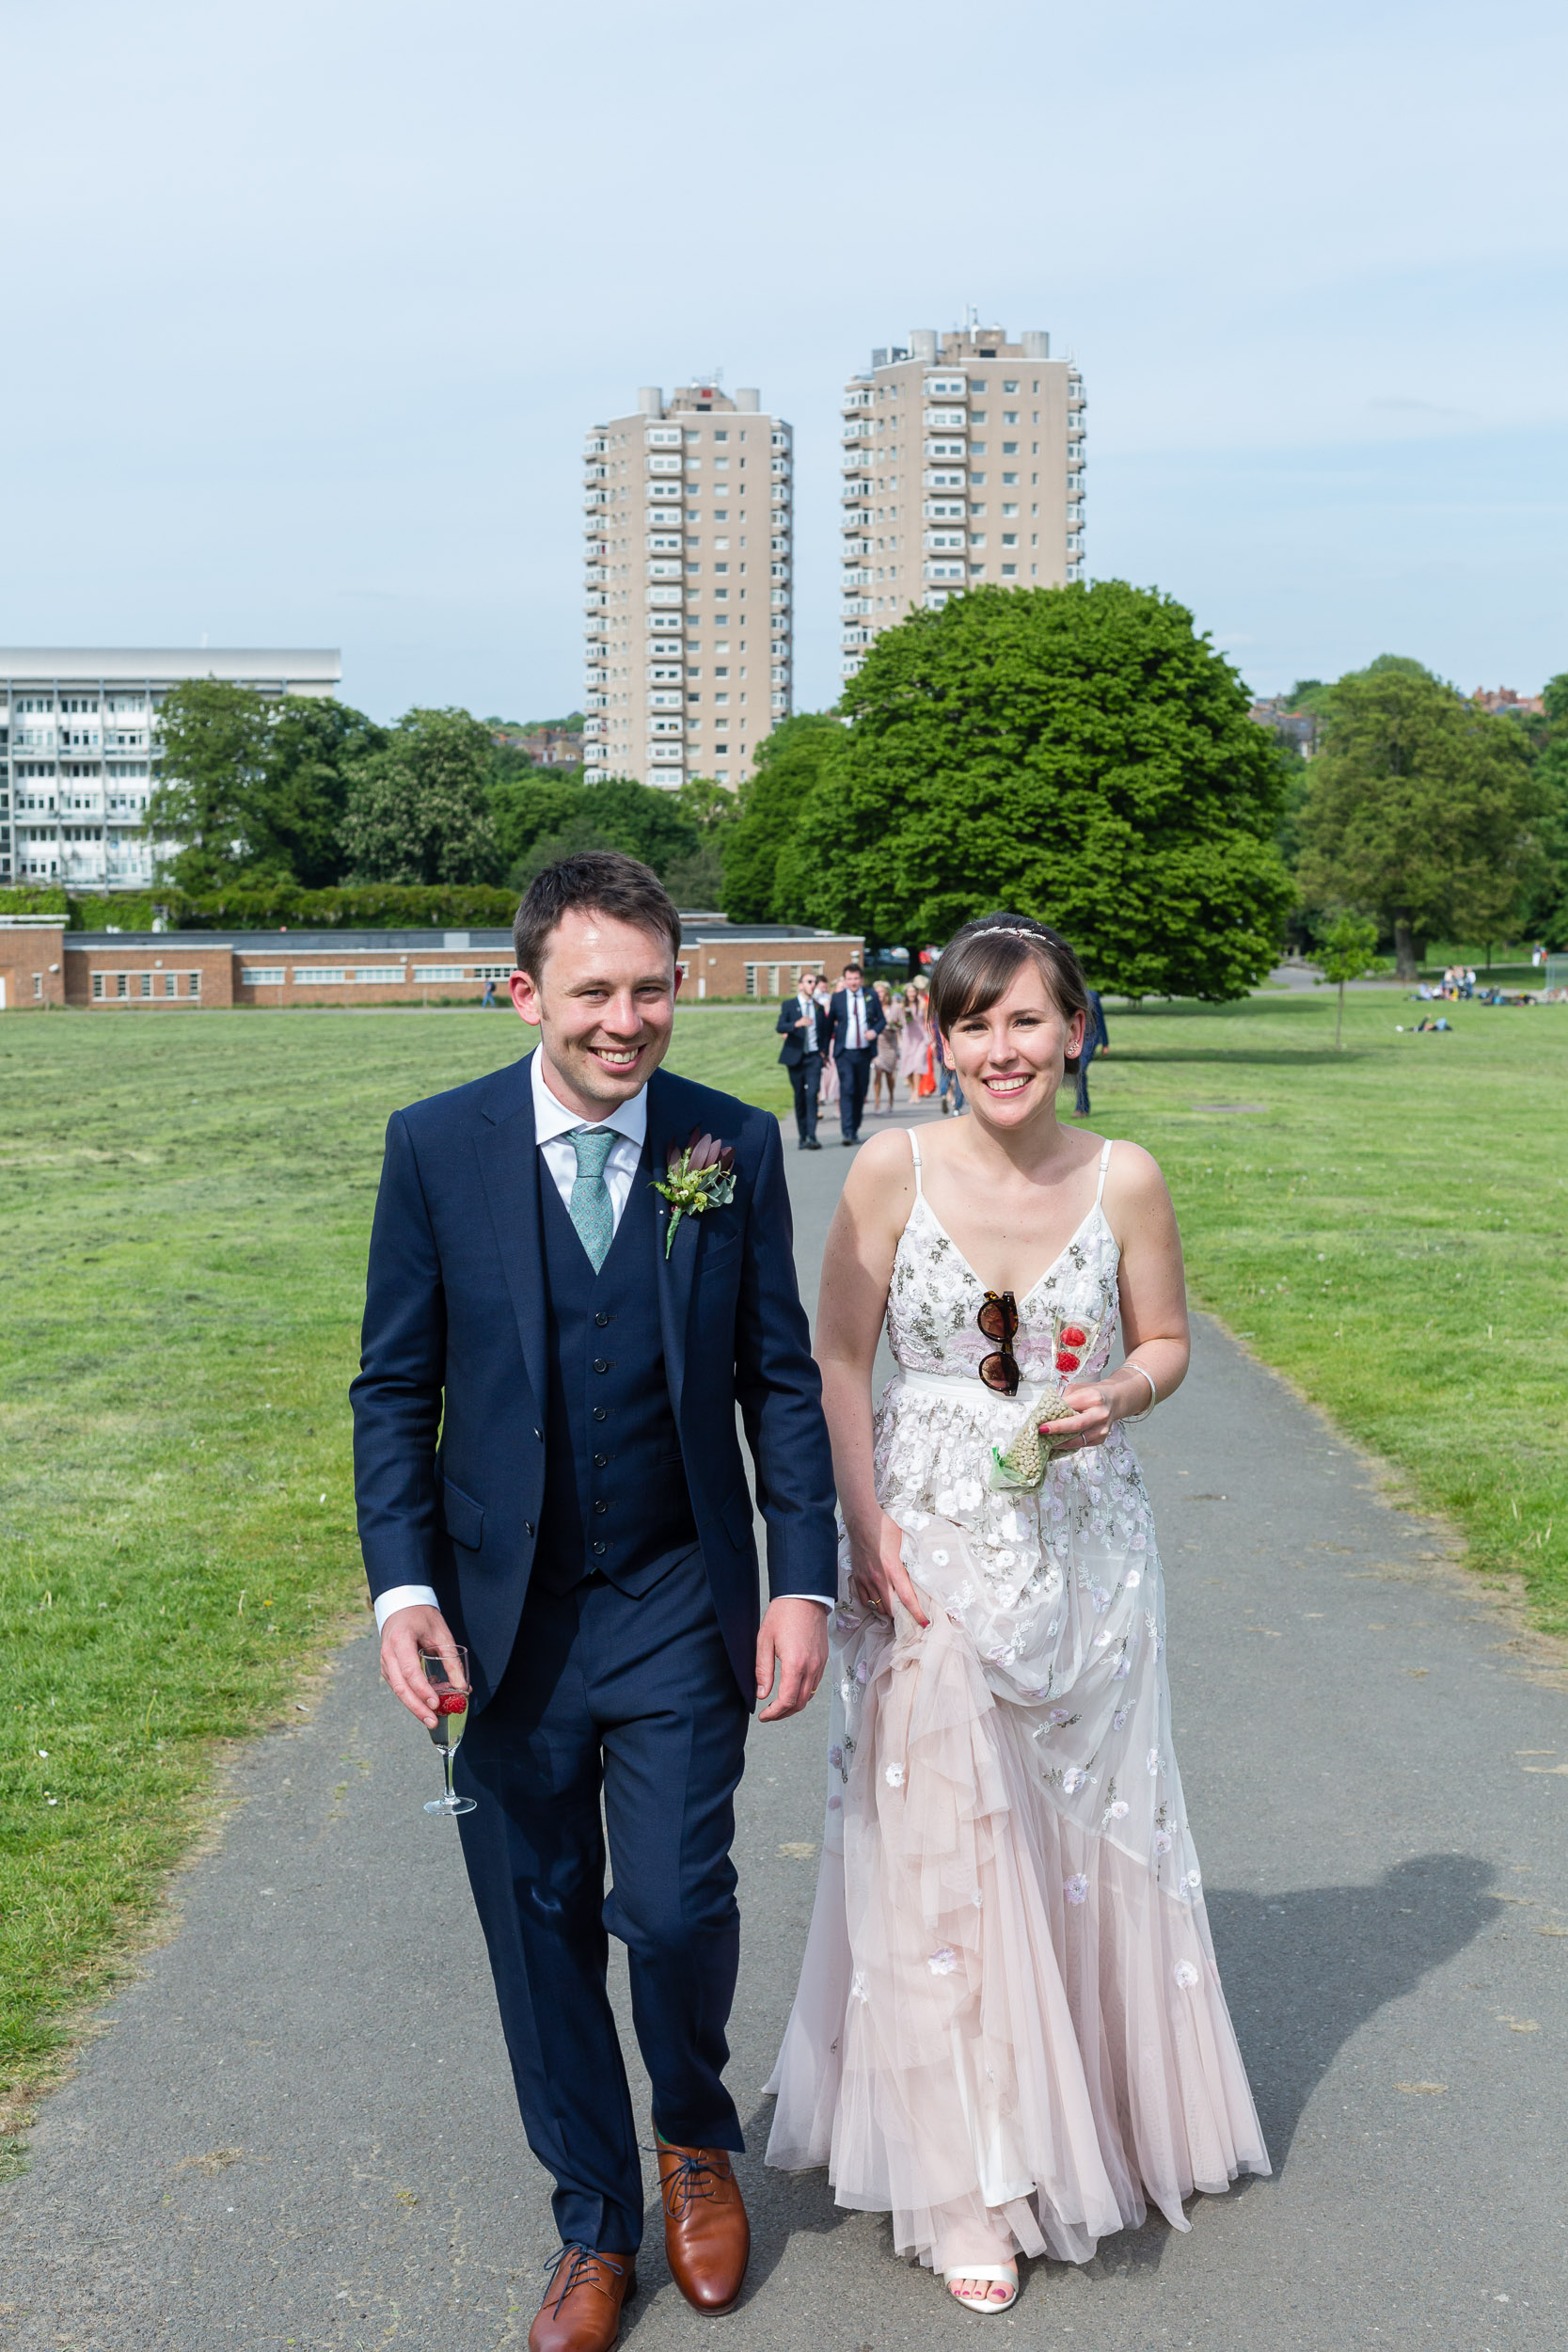 brockwell-lido-brixton-herne-hill-wedding-249.jpg